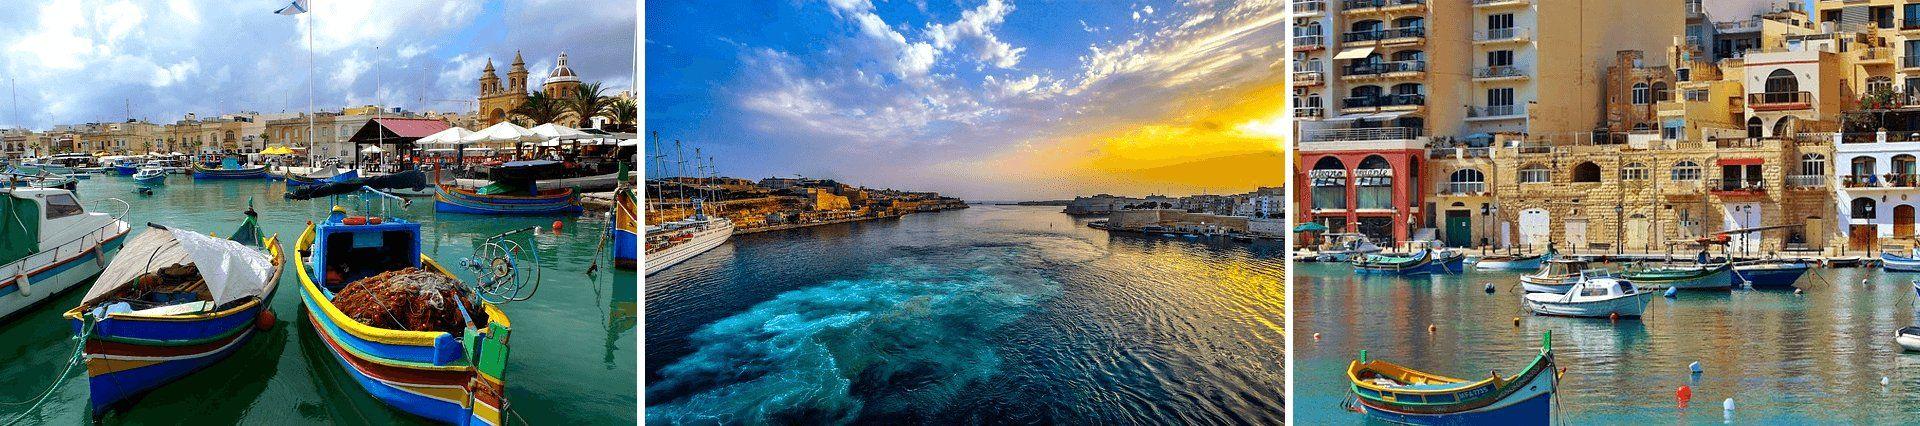 Malta Uhrzeit